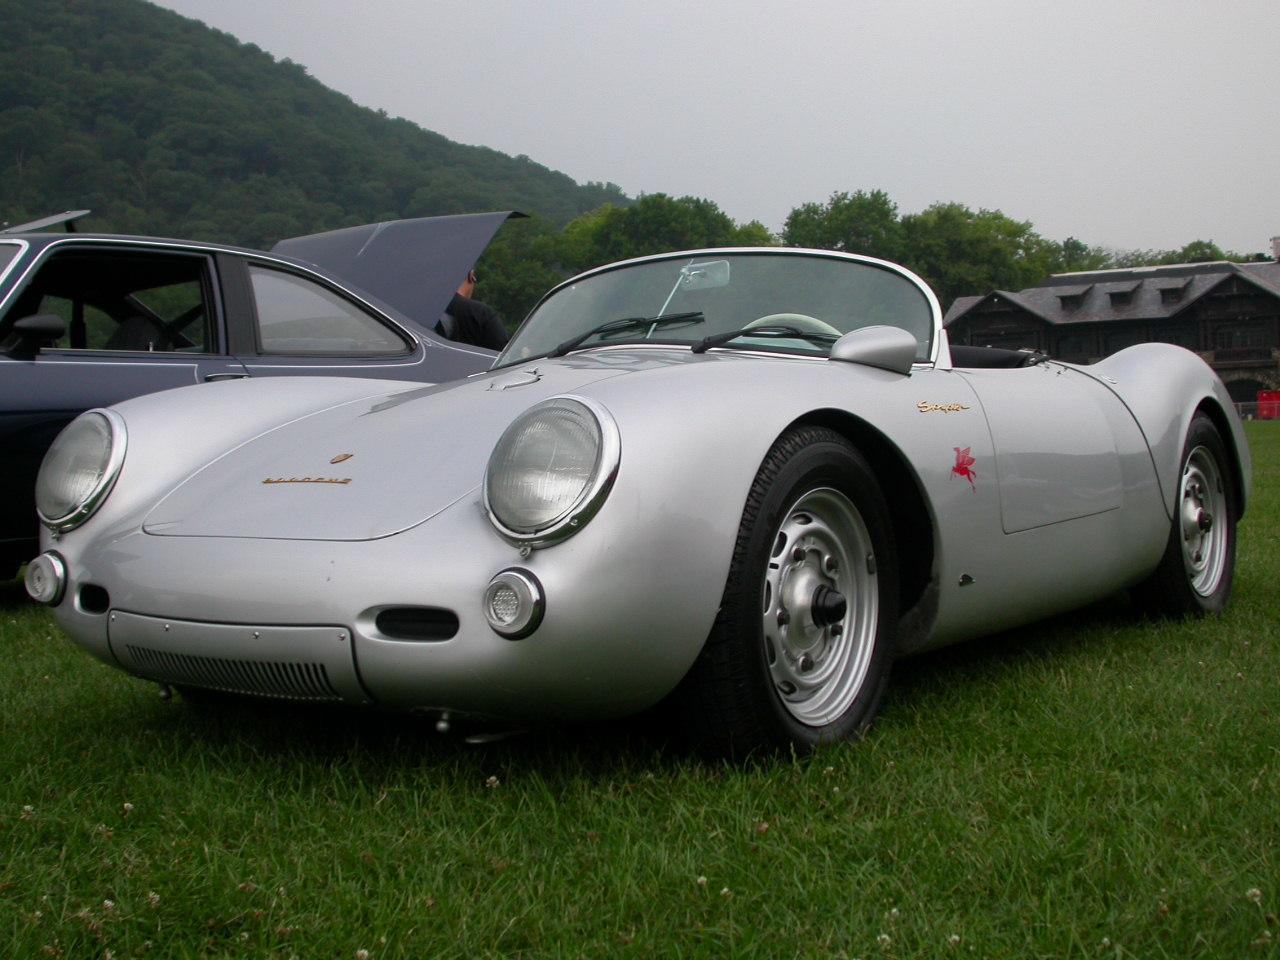 Porsche Spyder - Silver